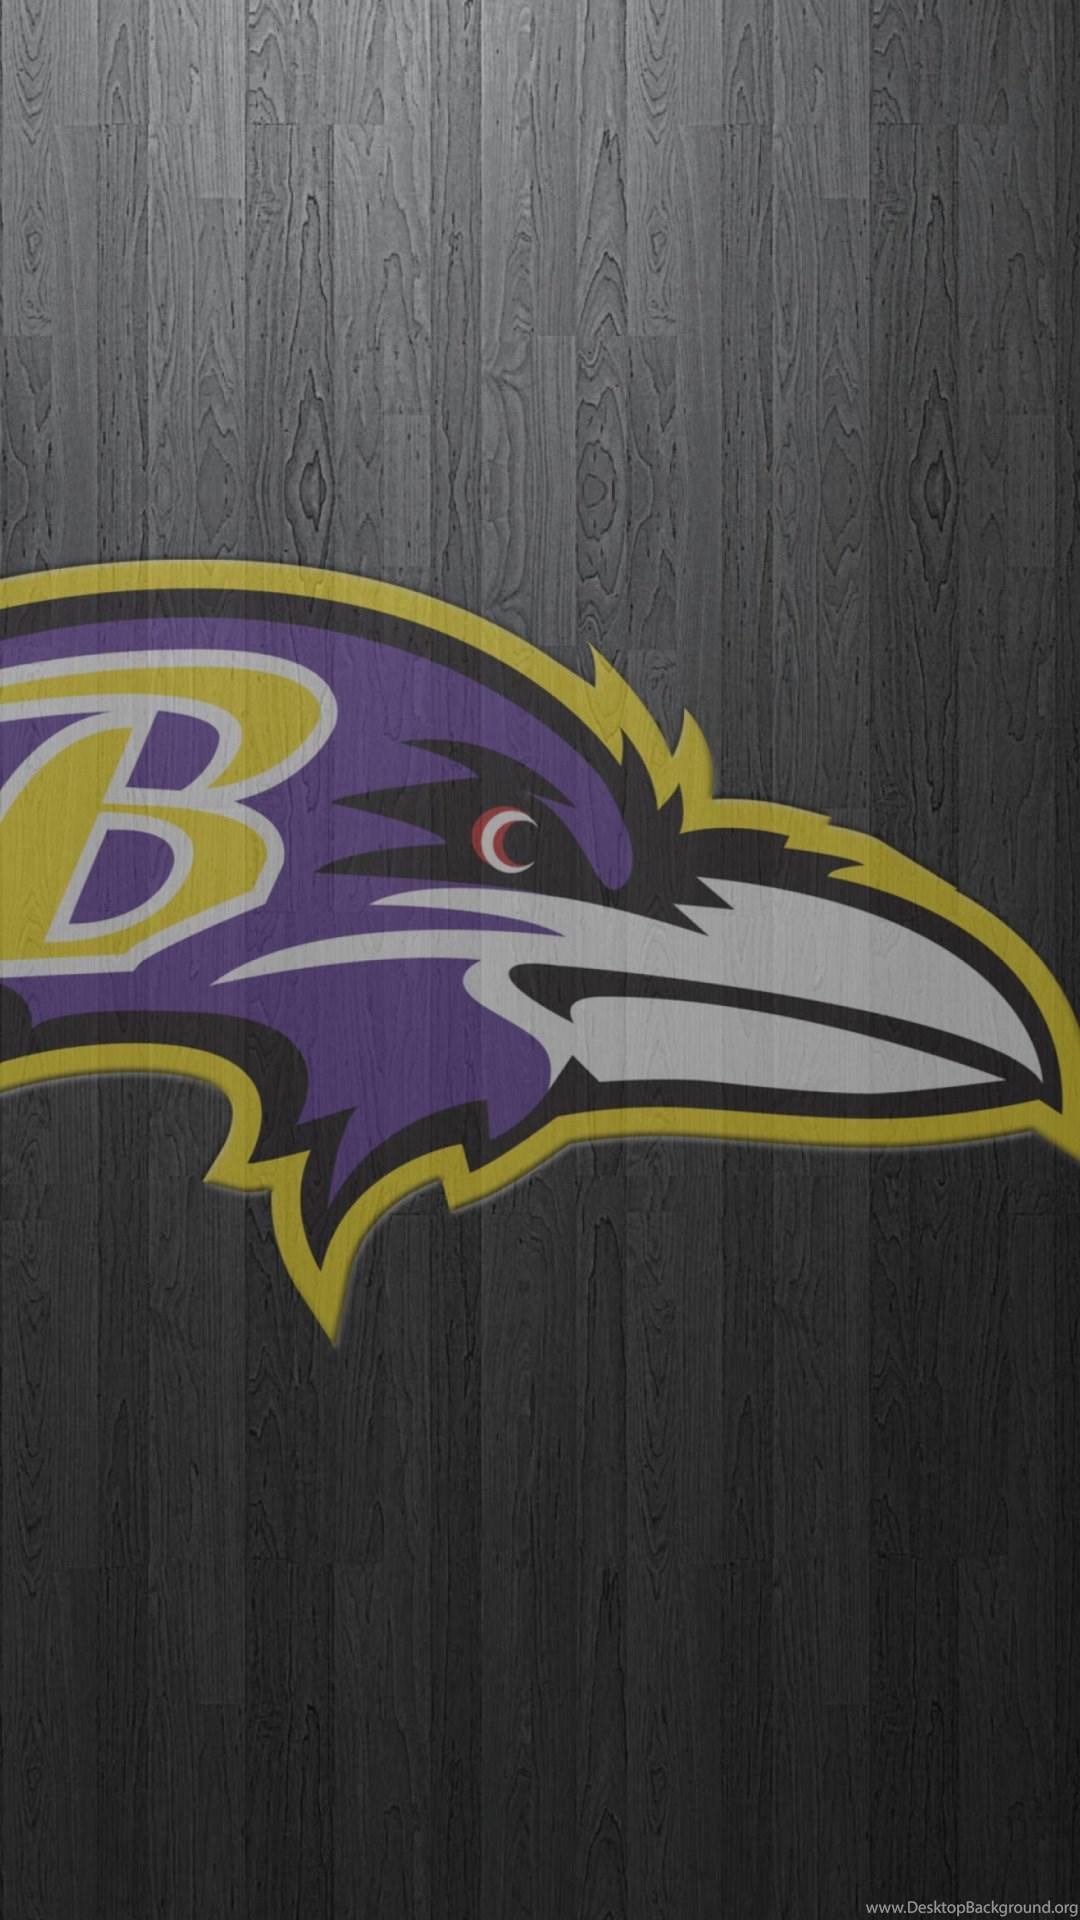 Baltimore ravens wallpaper hd - Baltimore ravens wallpapers android ...